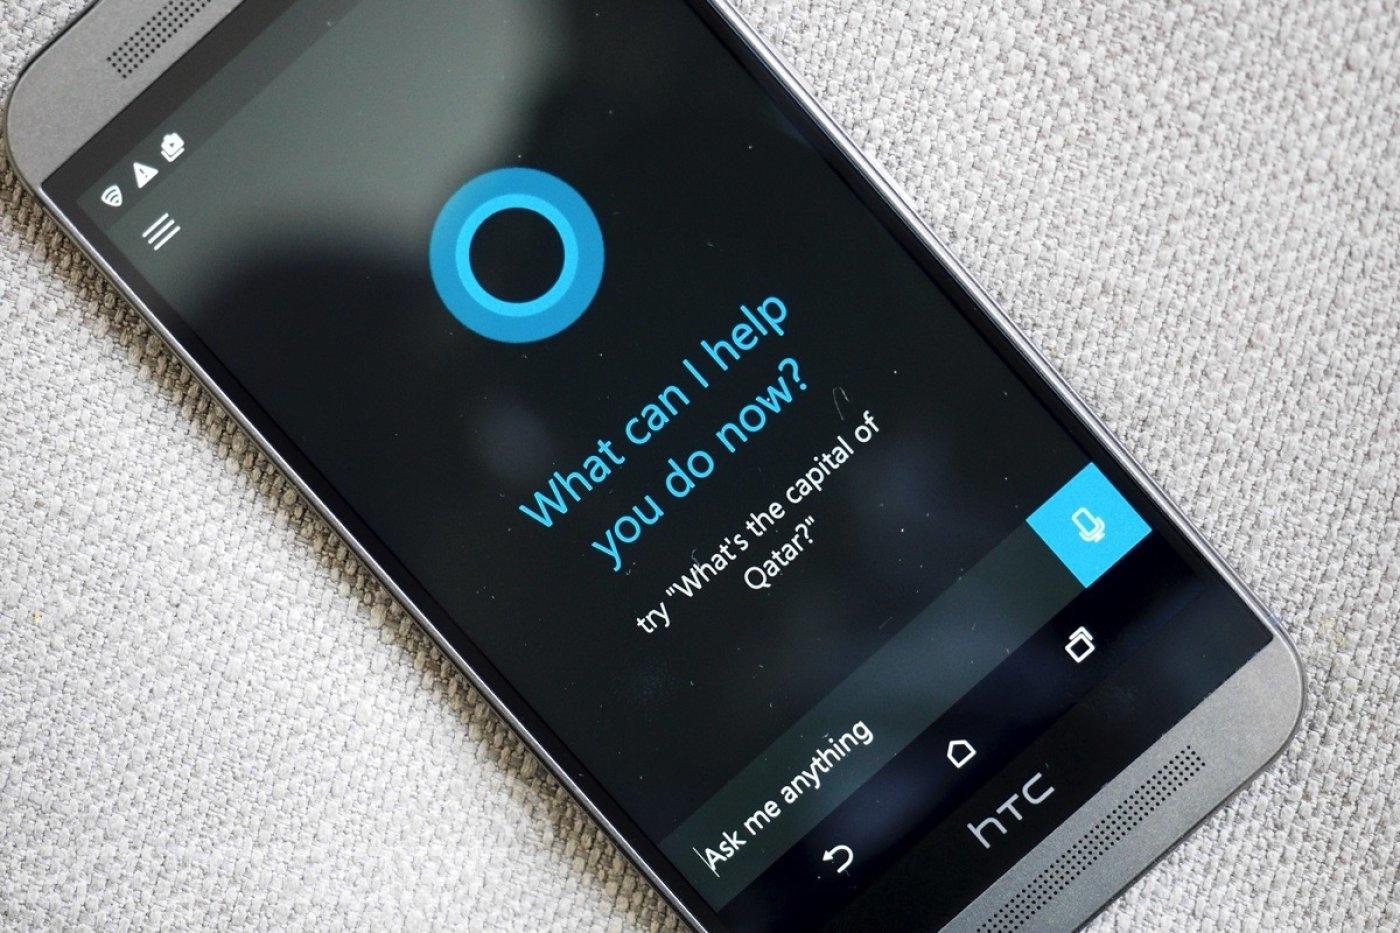 Microsoft teaches Cortana to proper communication